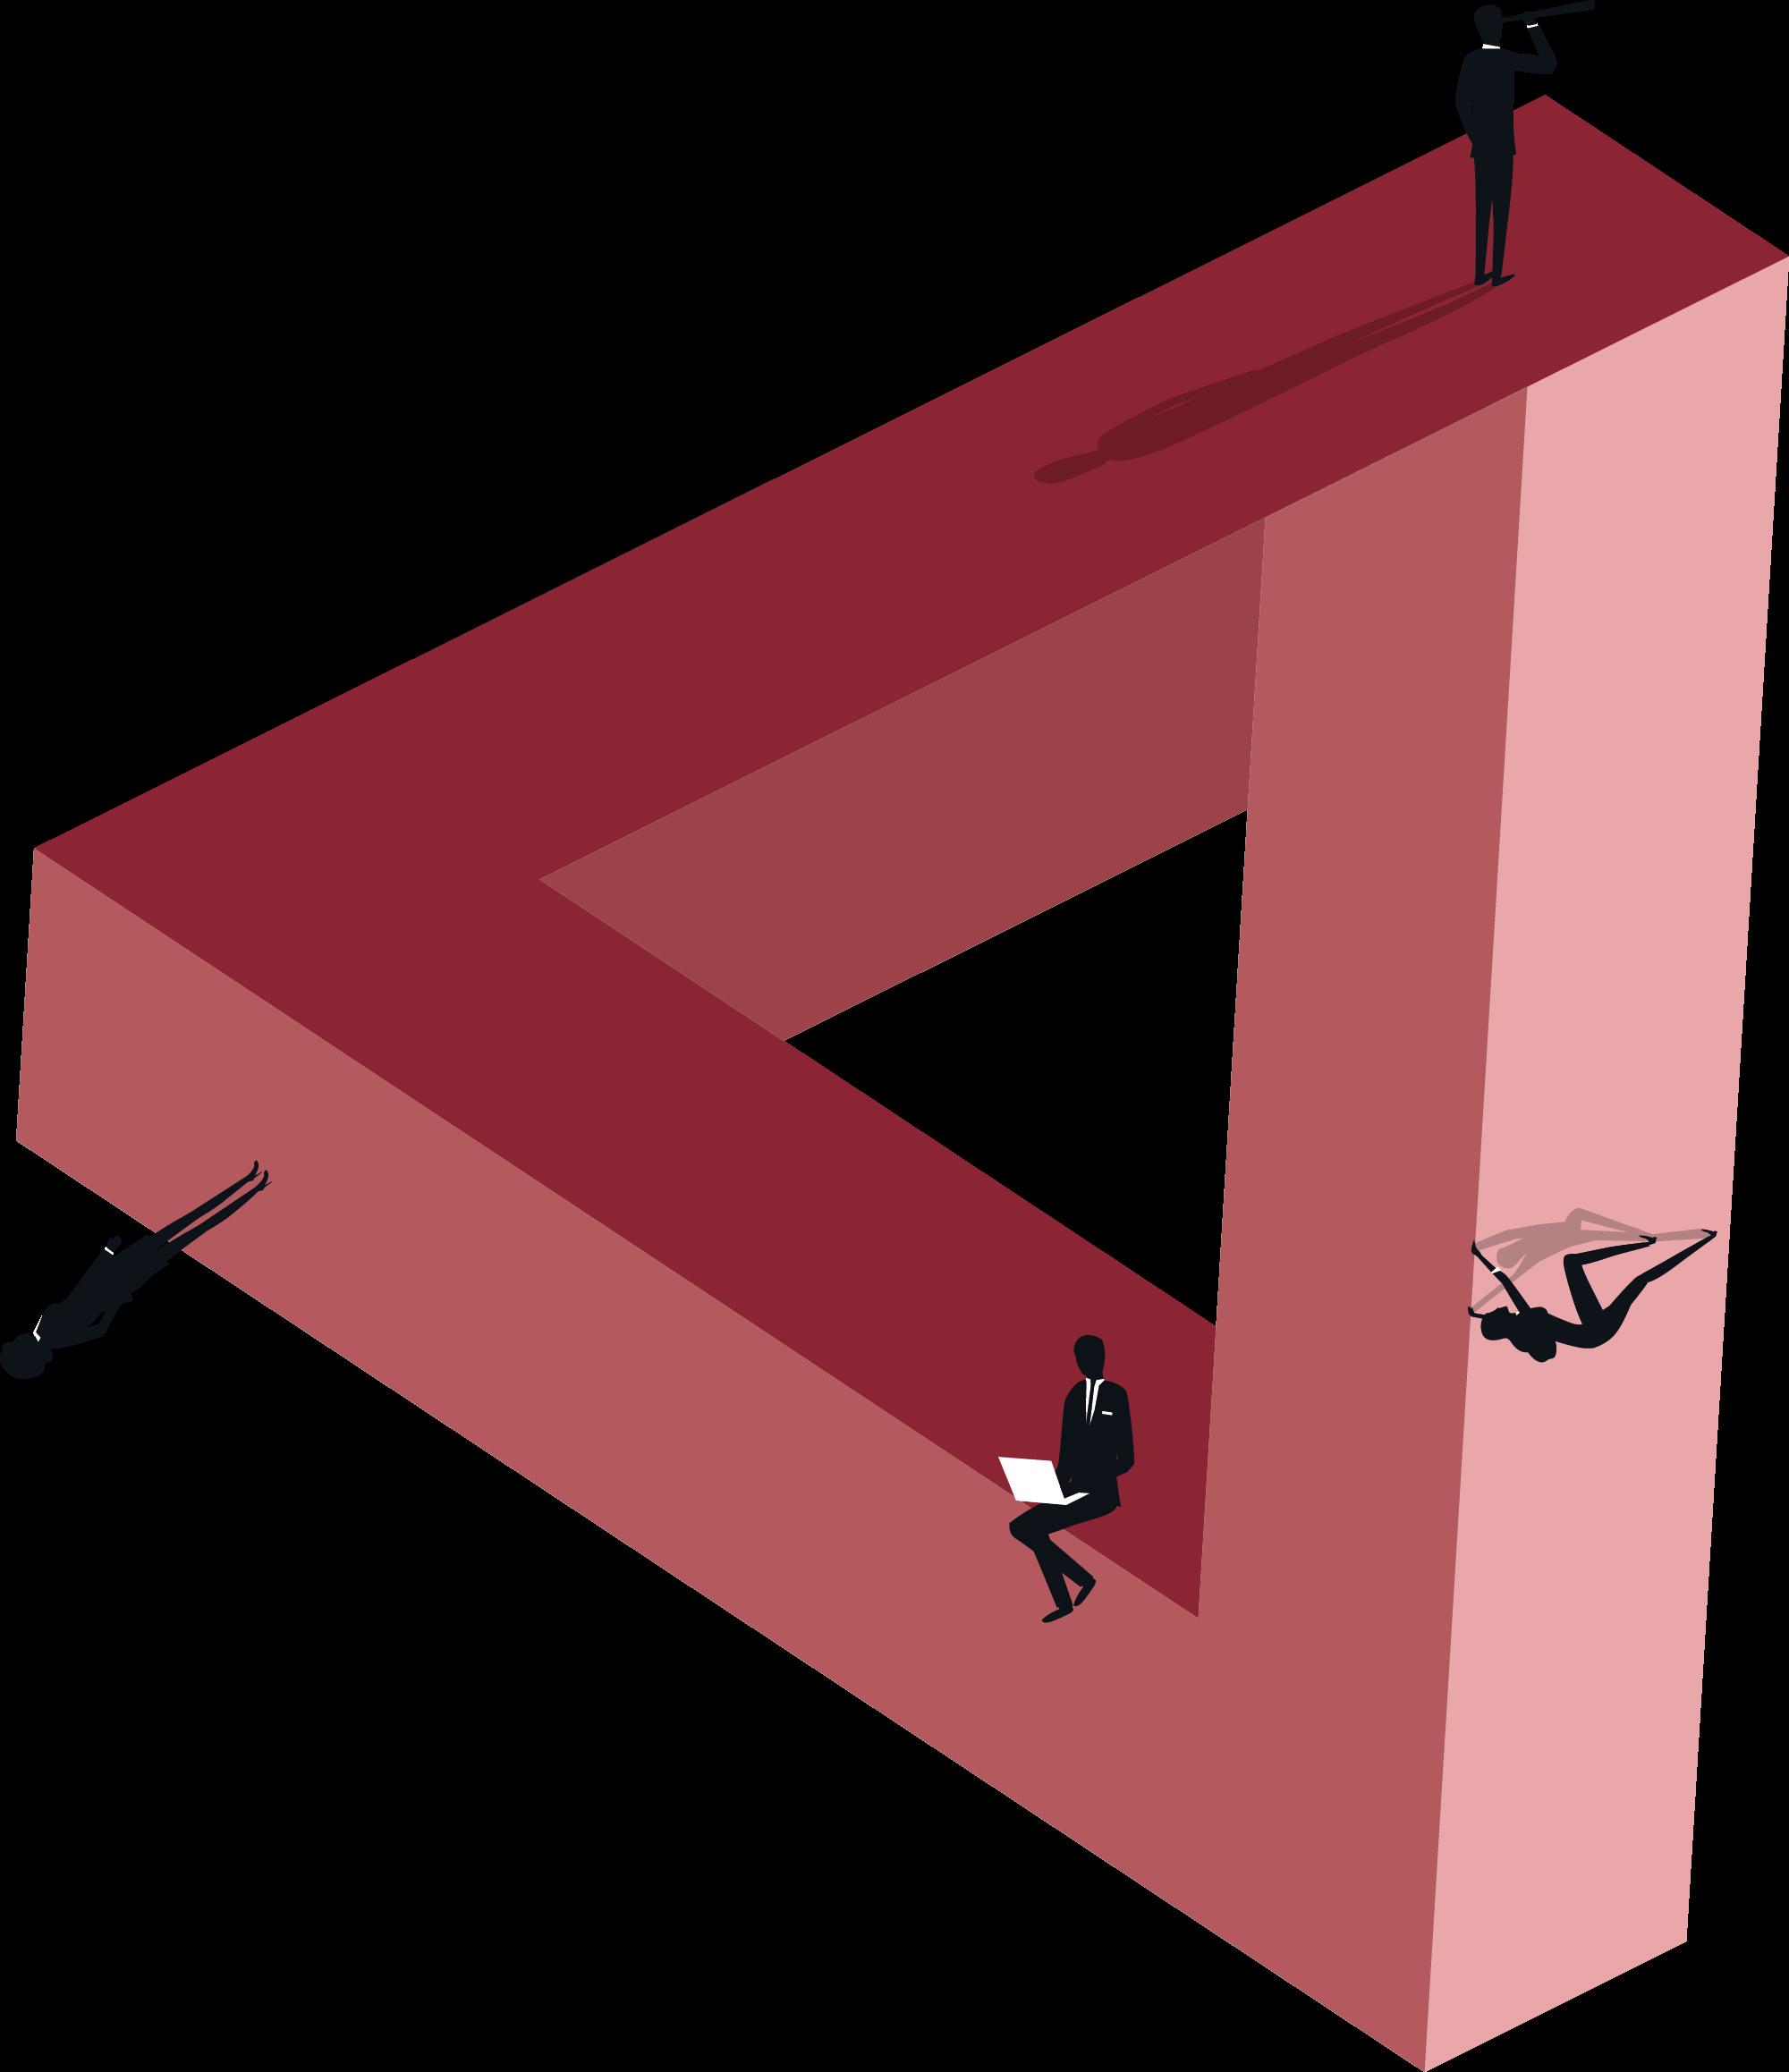 Penrose triangle illustration for the HC Group website